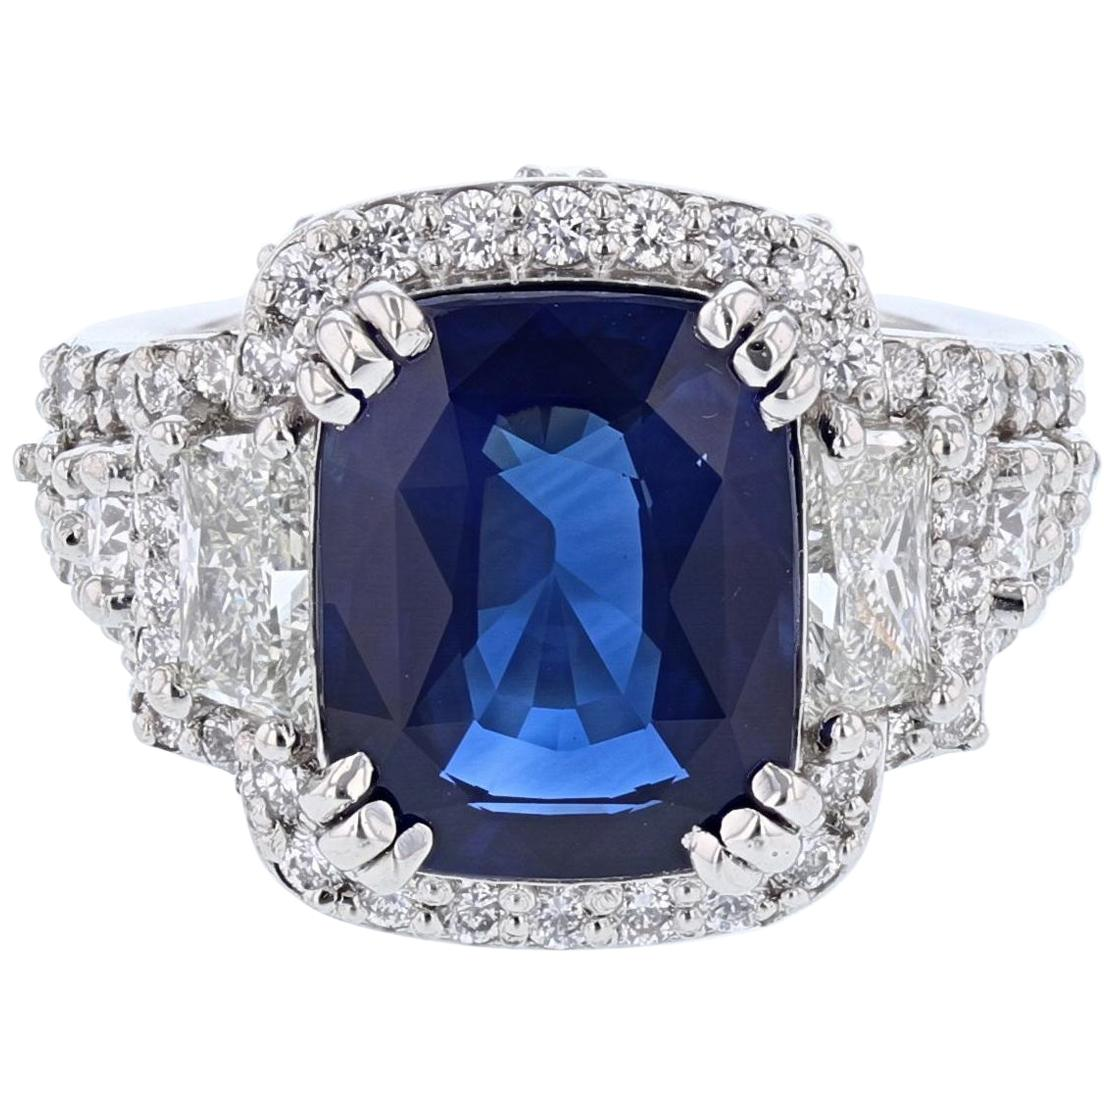 Platinum 6.58 Carat Sri Lankan Cornflower Blue Ceylon Sapphire and Diamond Ring